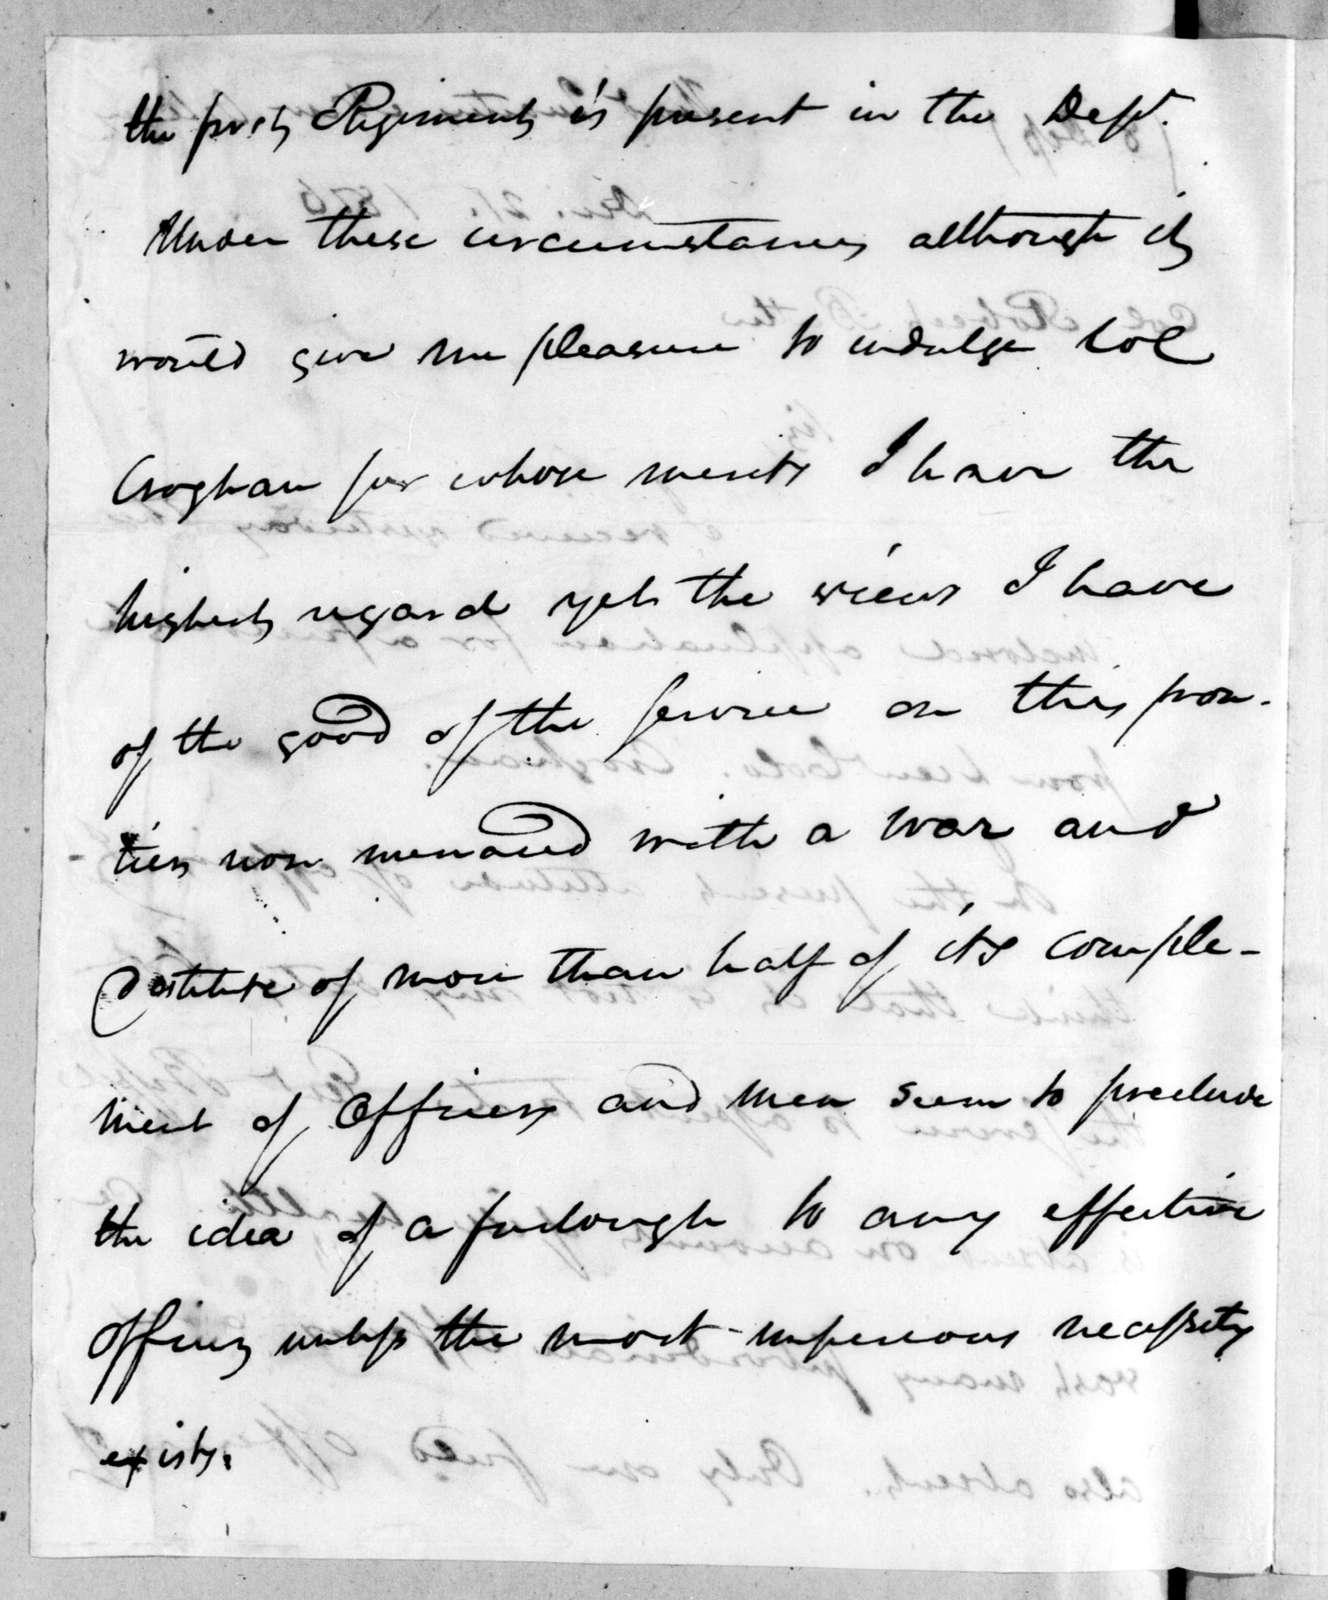 Eleazar Wheelock Ripley to Robert Butler, December 21, 1816